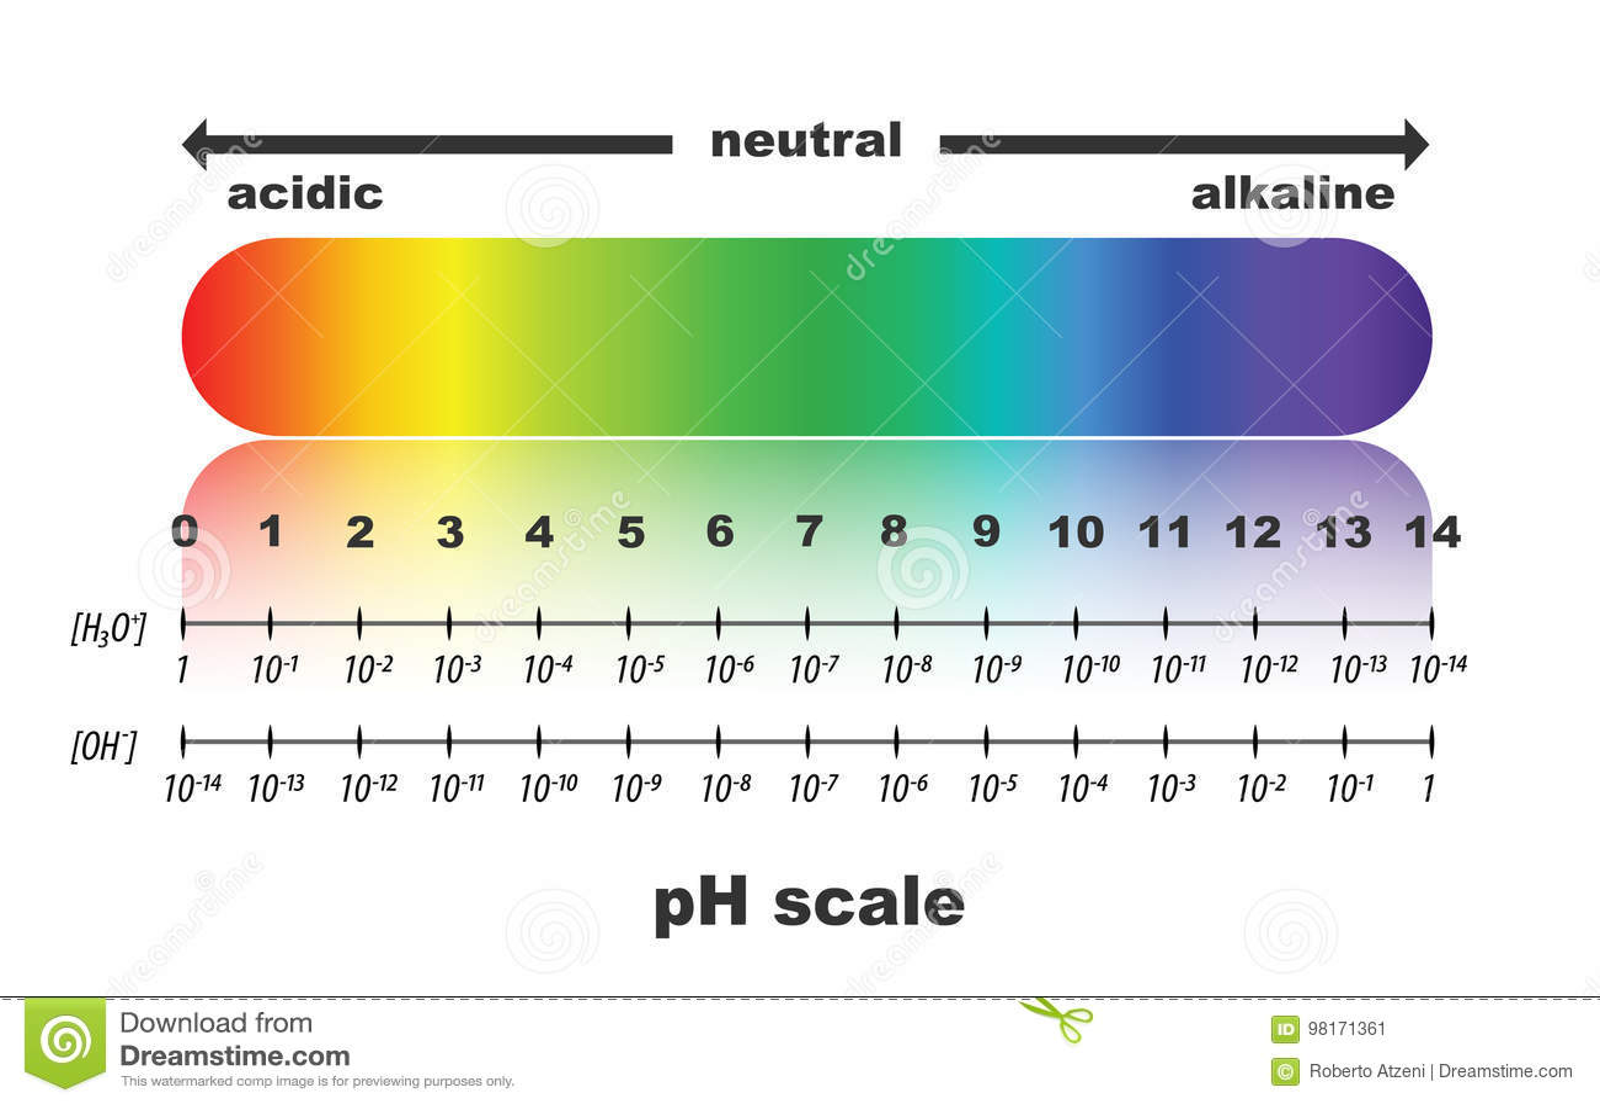 ph scale value , ph paper test , illustration